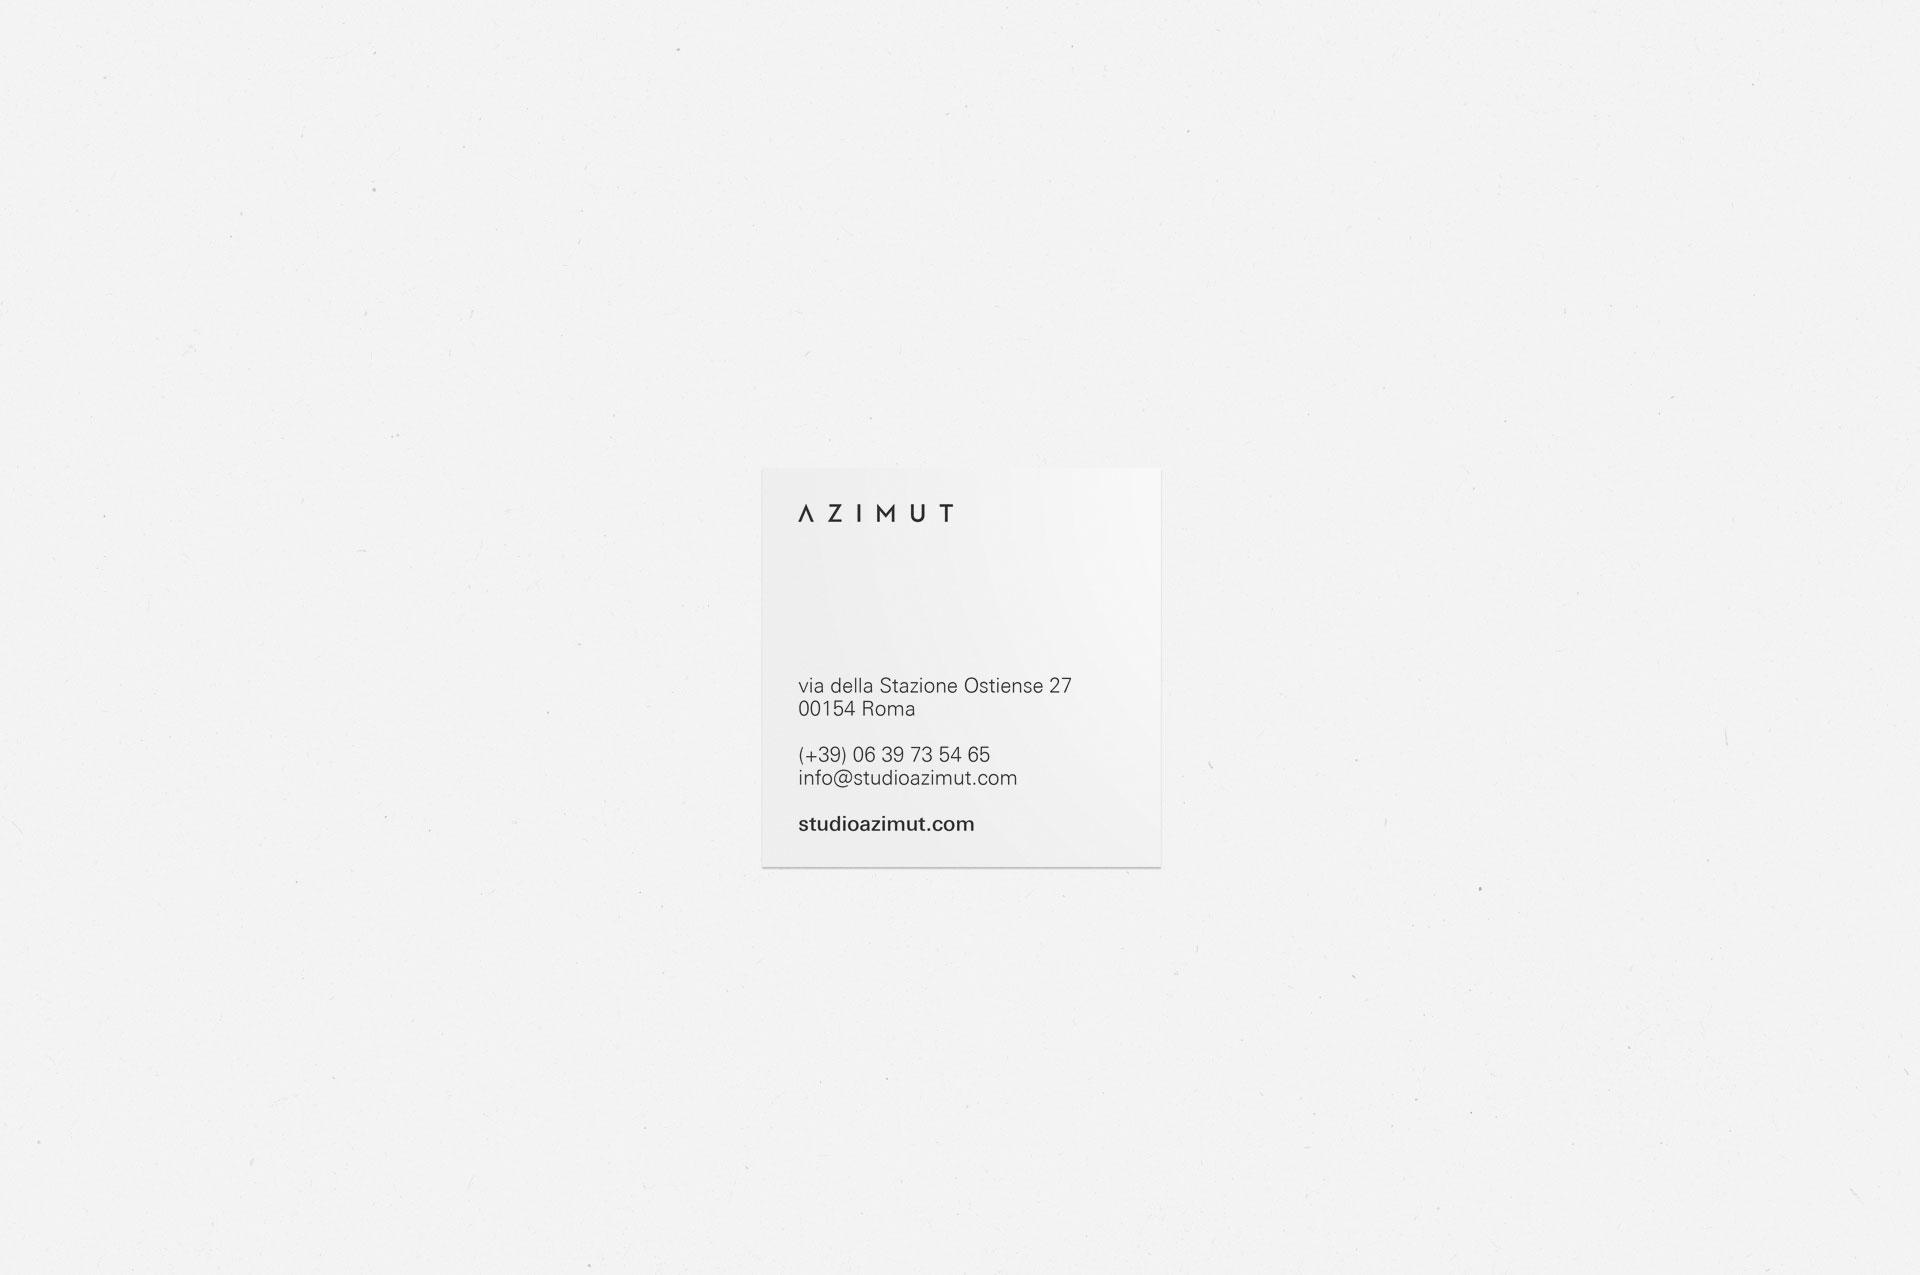 Studio Azimut Business Cards